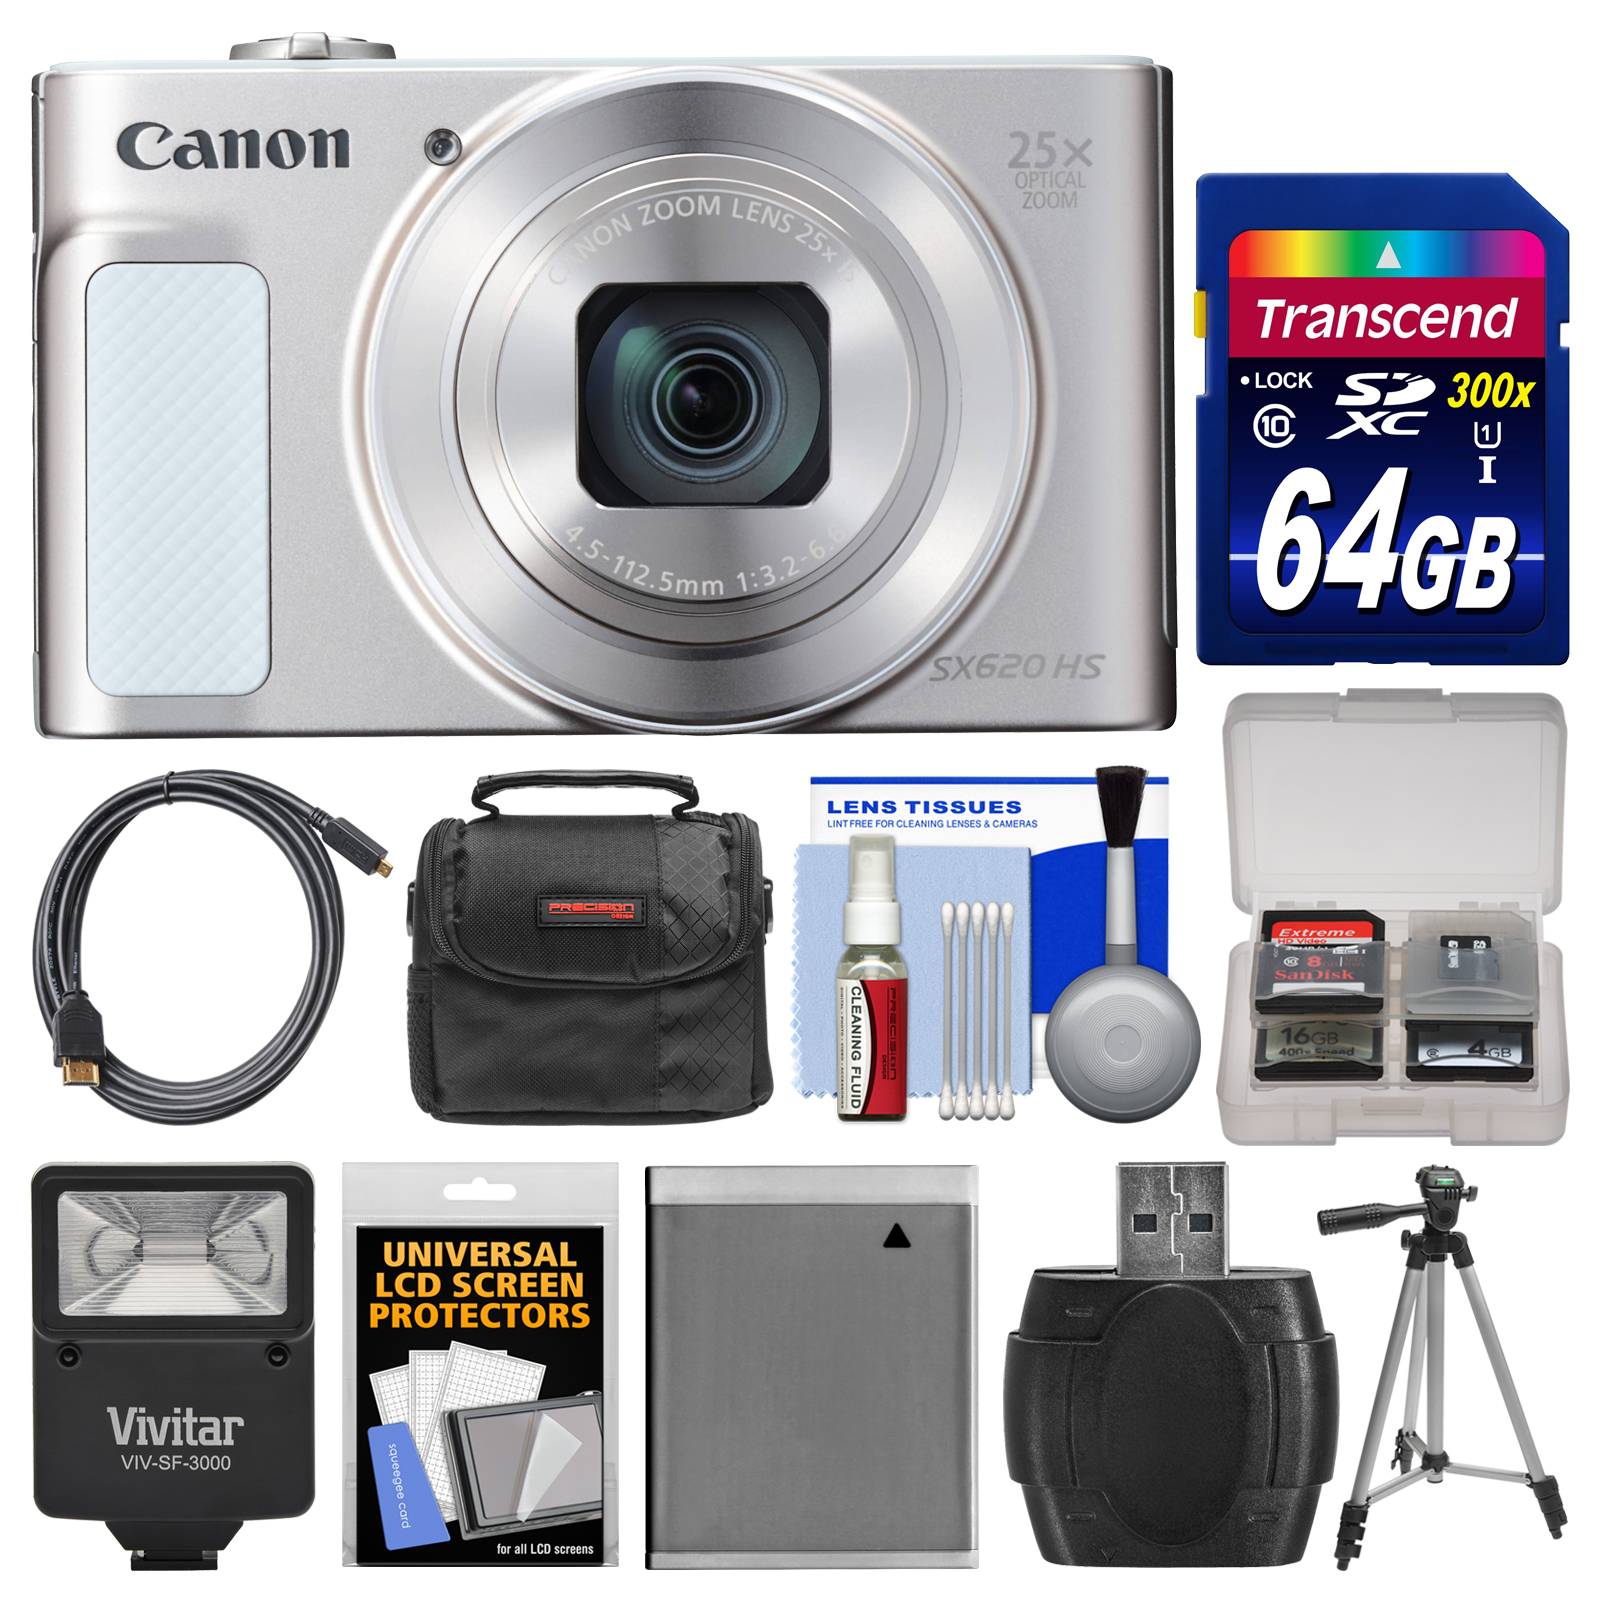 Canon PowerShot SX620 HS Wi-Fi Digital Camera (Silver) wi...